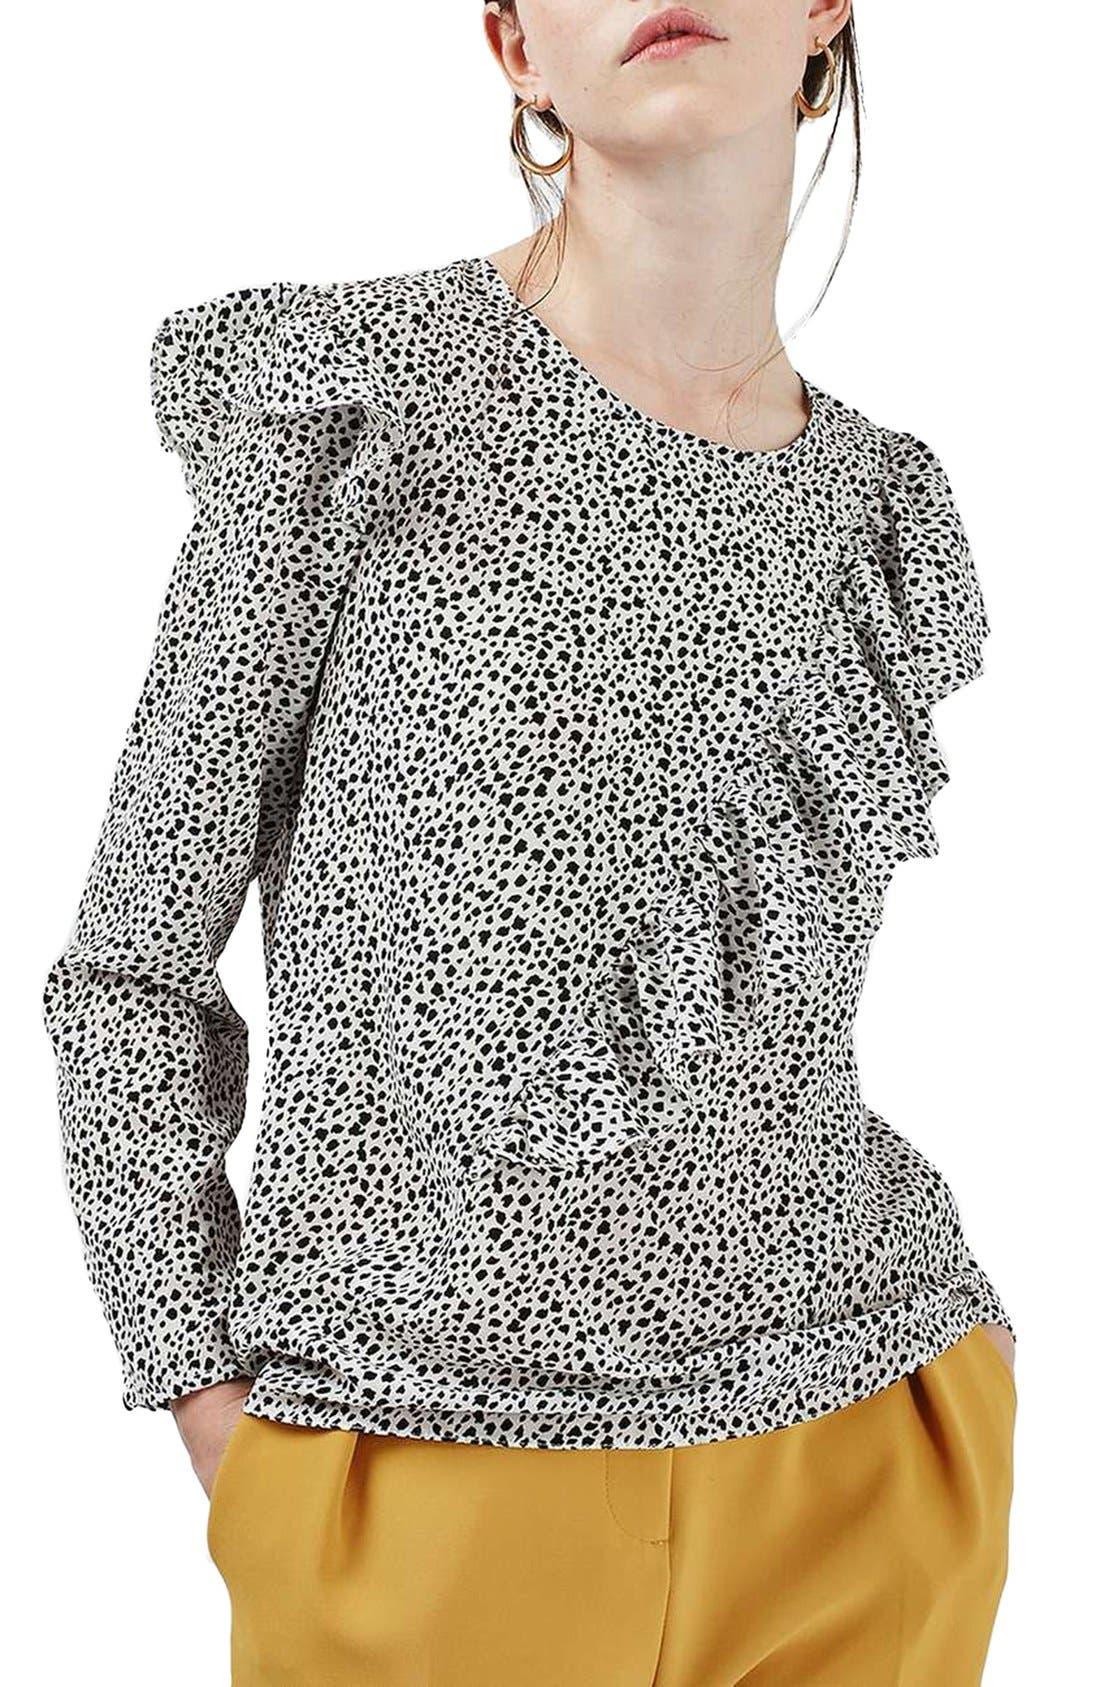 Main Image - Topshop Animal Print Ruffle Blouse